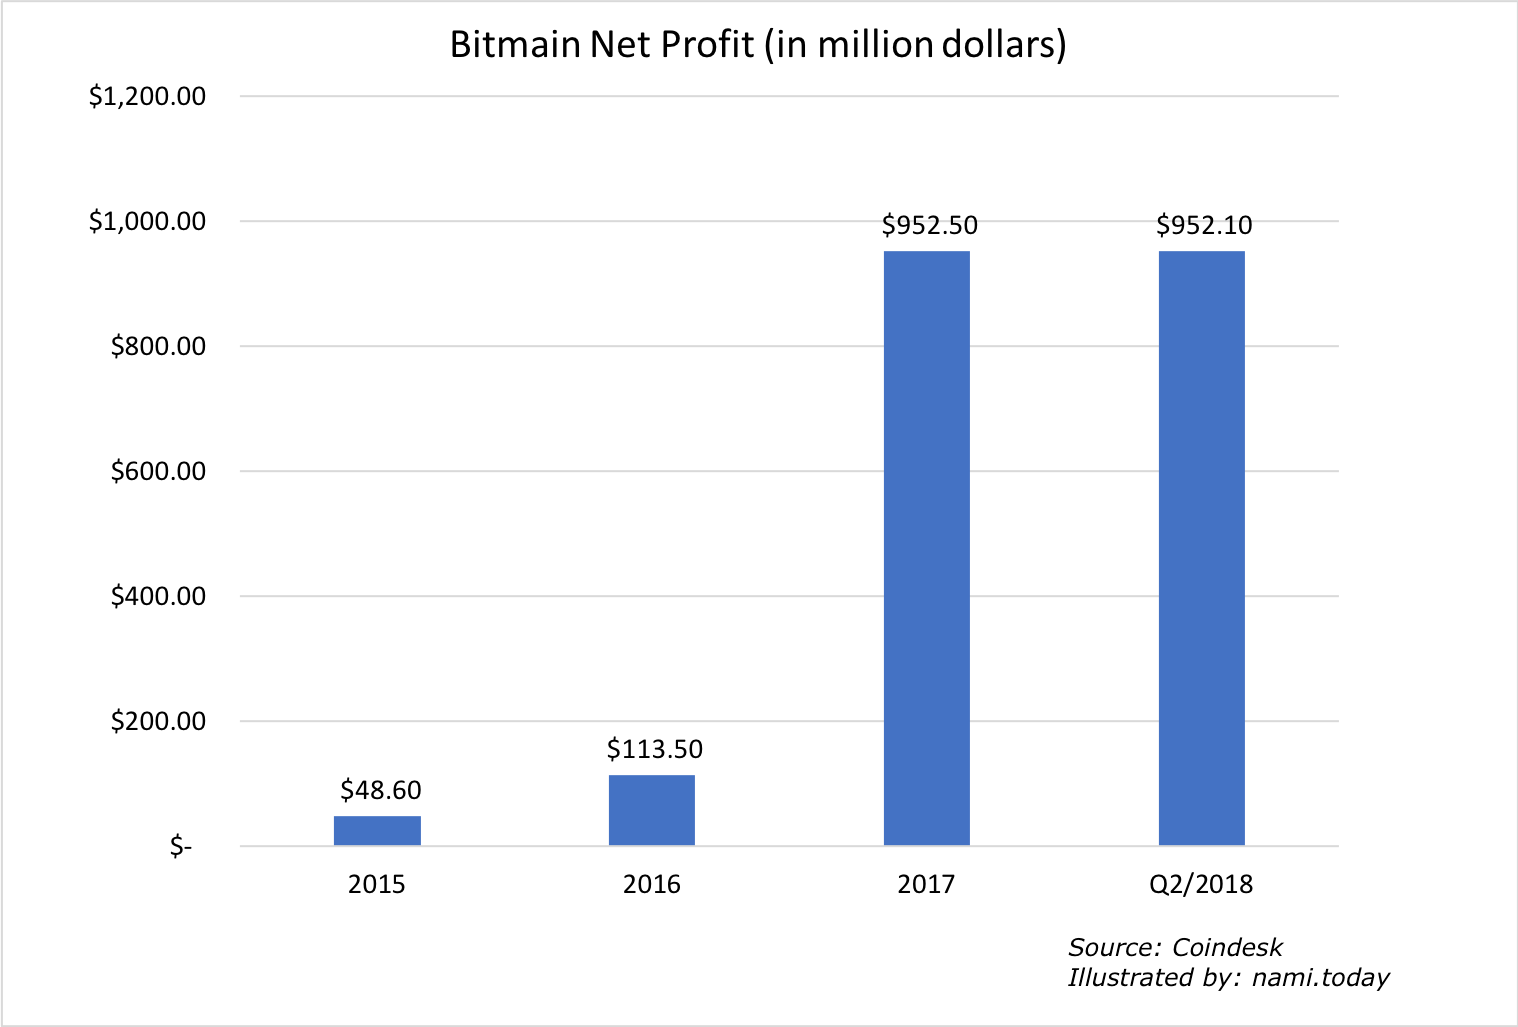 Bitmain profit